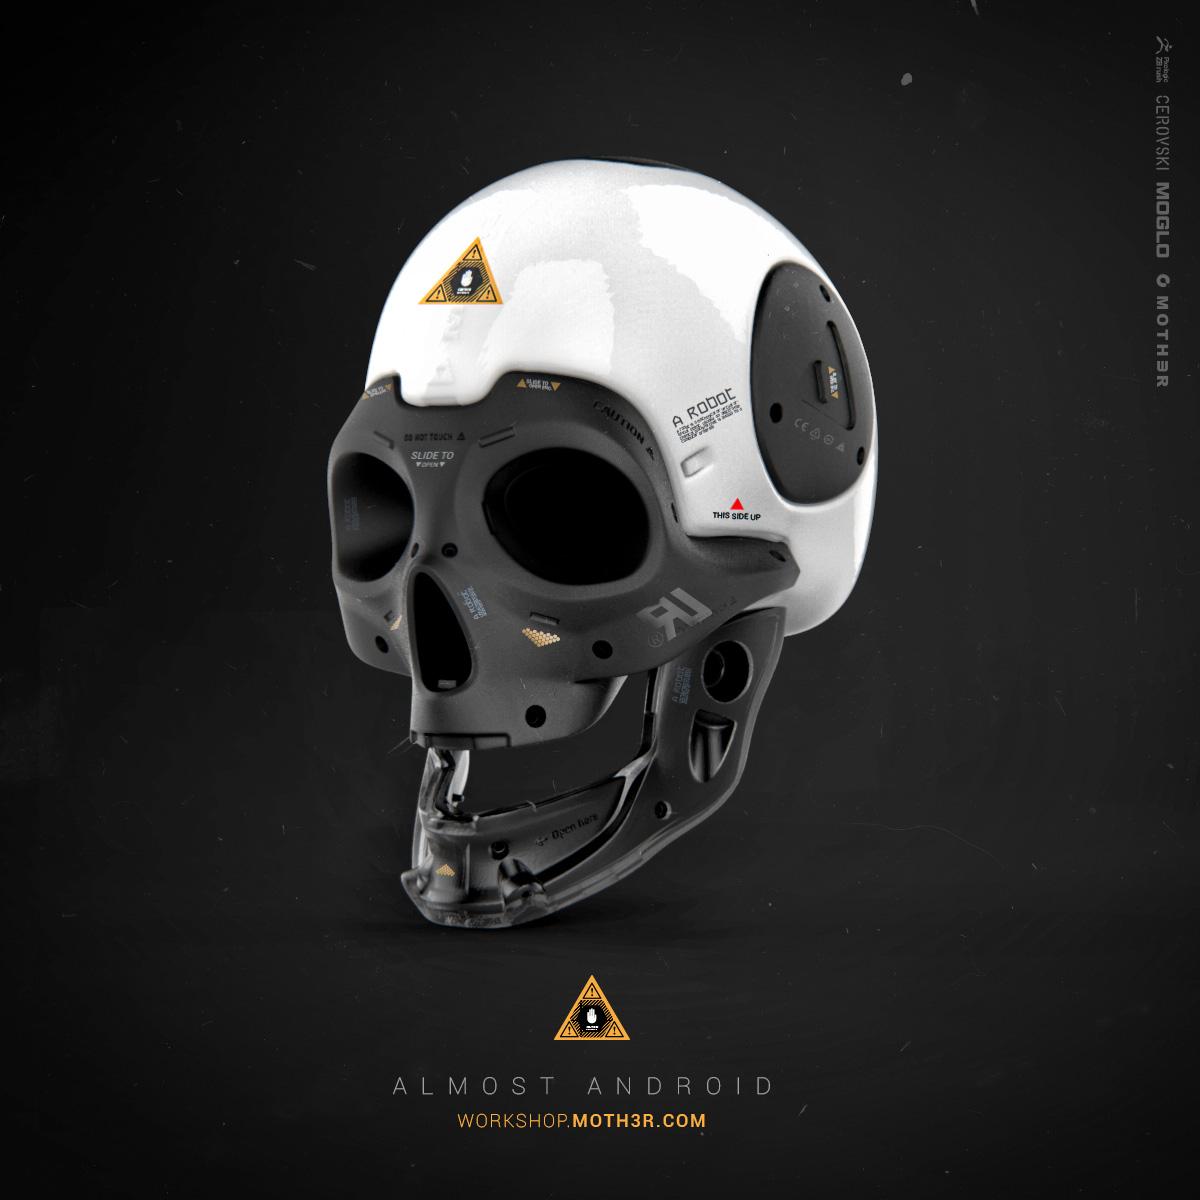 http://fc04.deviantart.net/fs70/f/2014/170/9/2/almost_human___skull_by_moth3r-d7n31e5.jpg